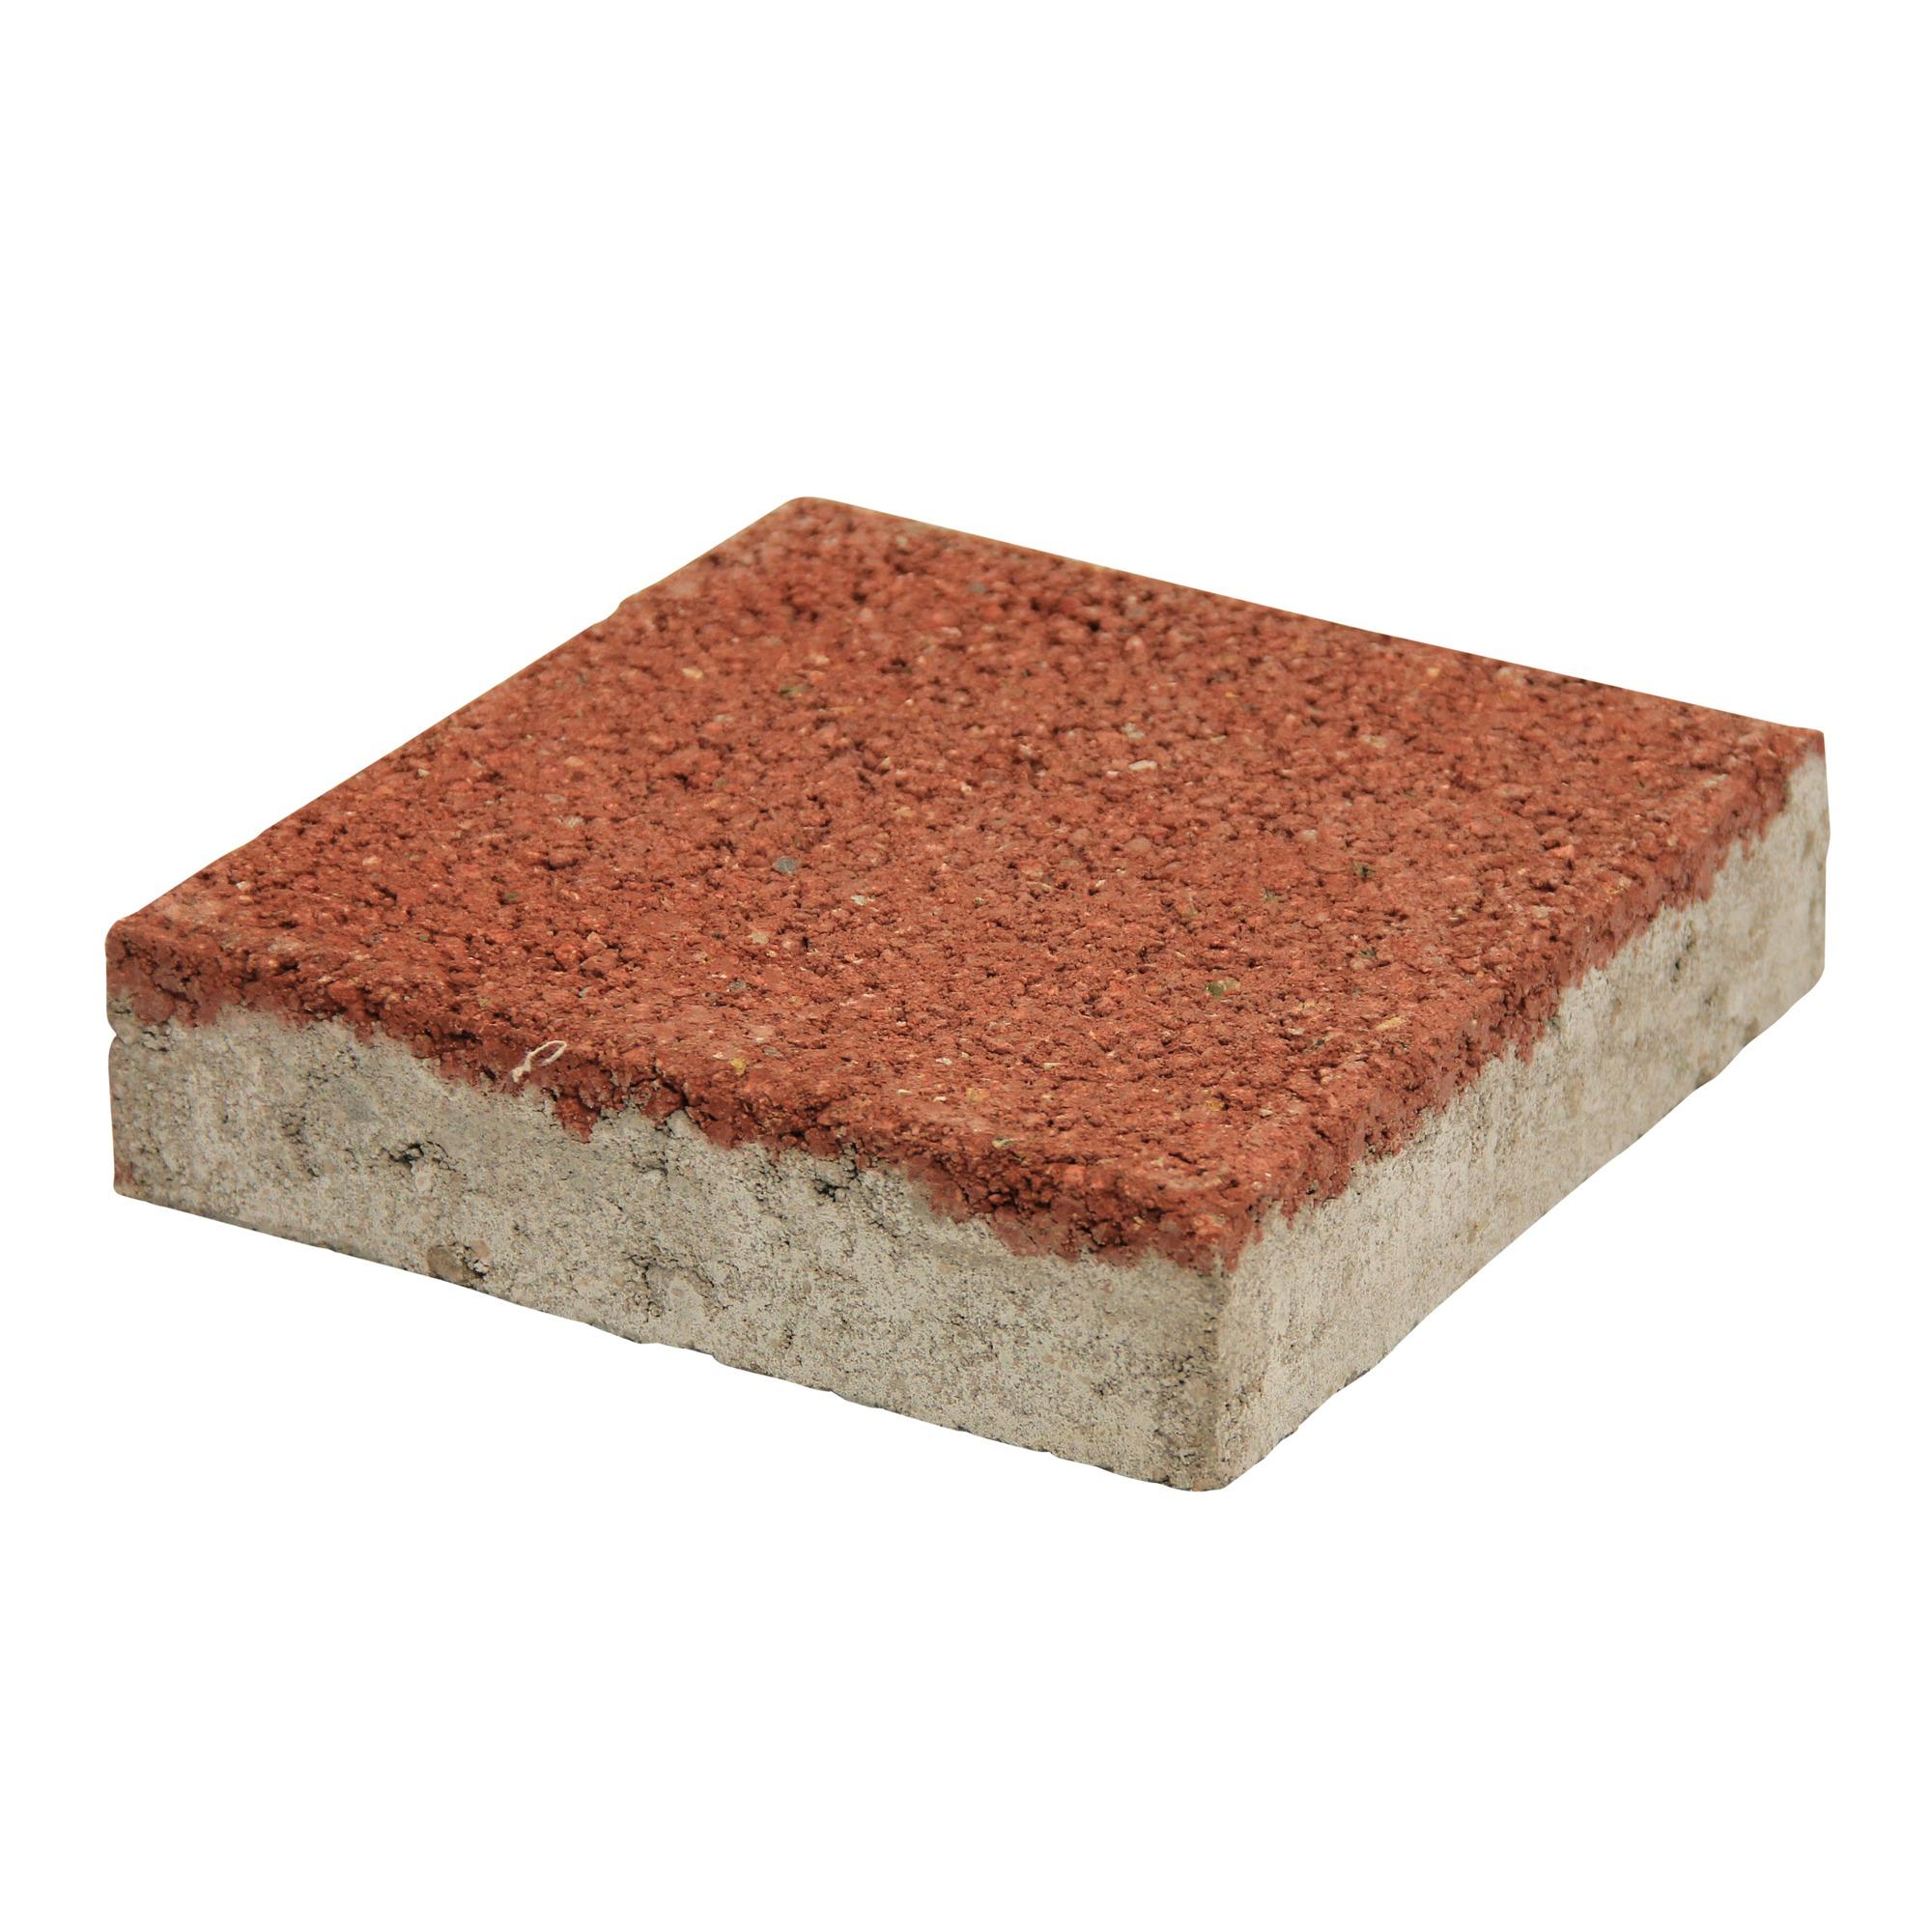 Pasblok Beton Rood 20x20 cm - 150 Stuks - 6,0 m2